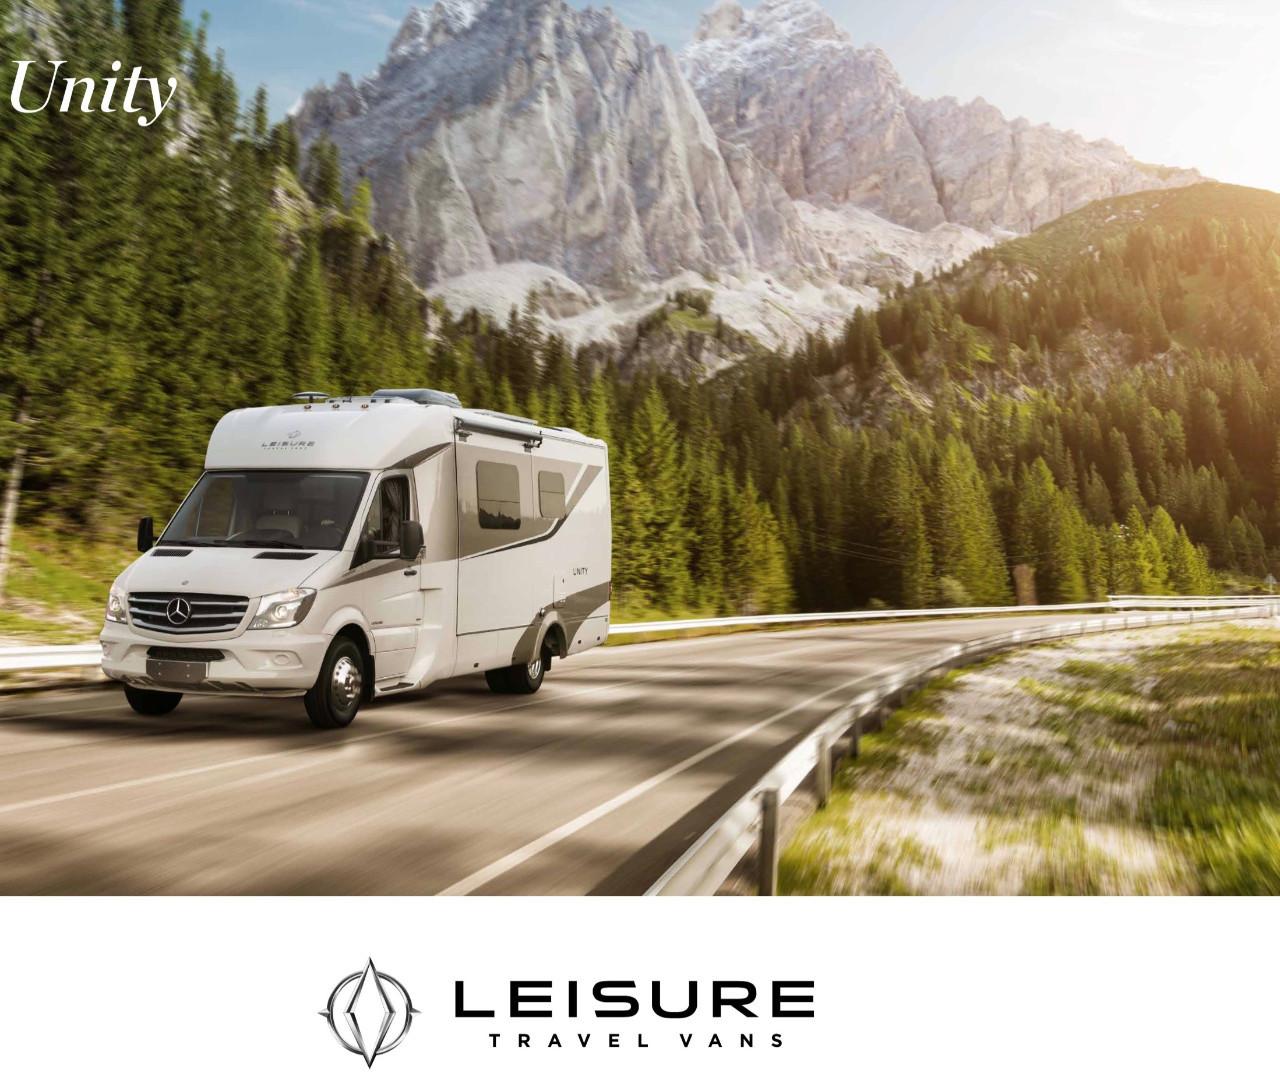 Leisure Travel Vans Unity FX For Sale - Leisure Travel Vans RVs ...